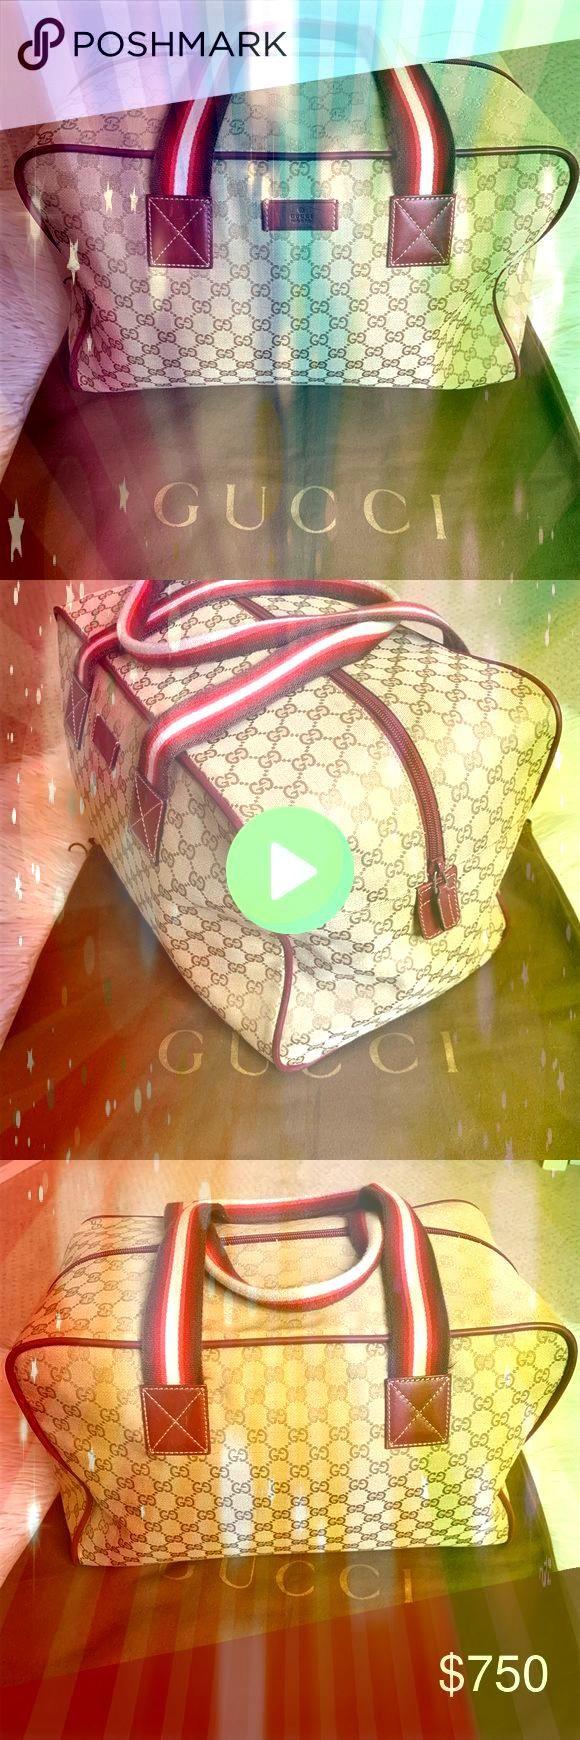 TRAVEL DUFFLE BAG GUCCI TRAVEL DUFFLE BAG PERFECT TRAVEL BAG FOR TRIPS  G 20 Perfect Boho Travel Outfits For Any Trip Purple Violet Vegan Crossbody Shoulder Travel Bag Sm...